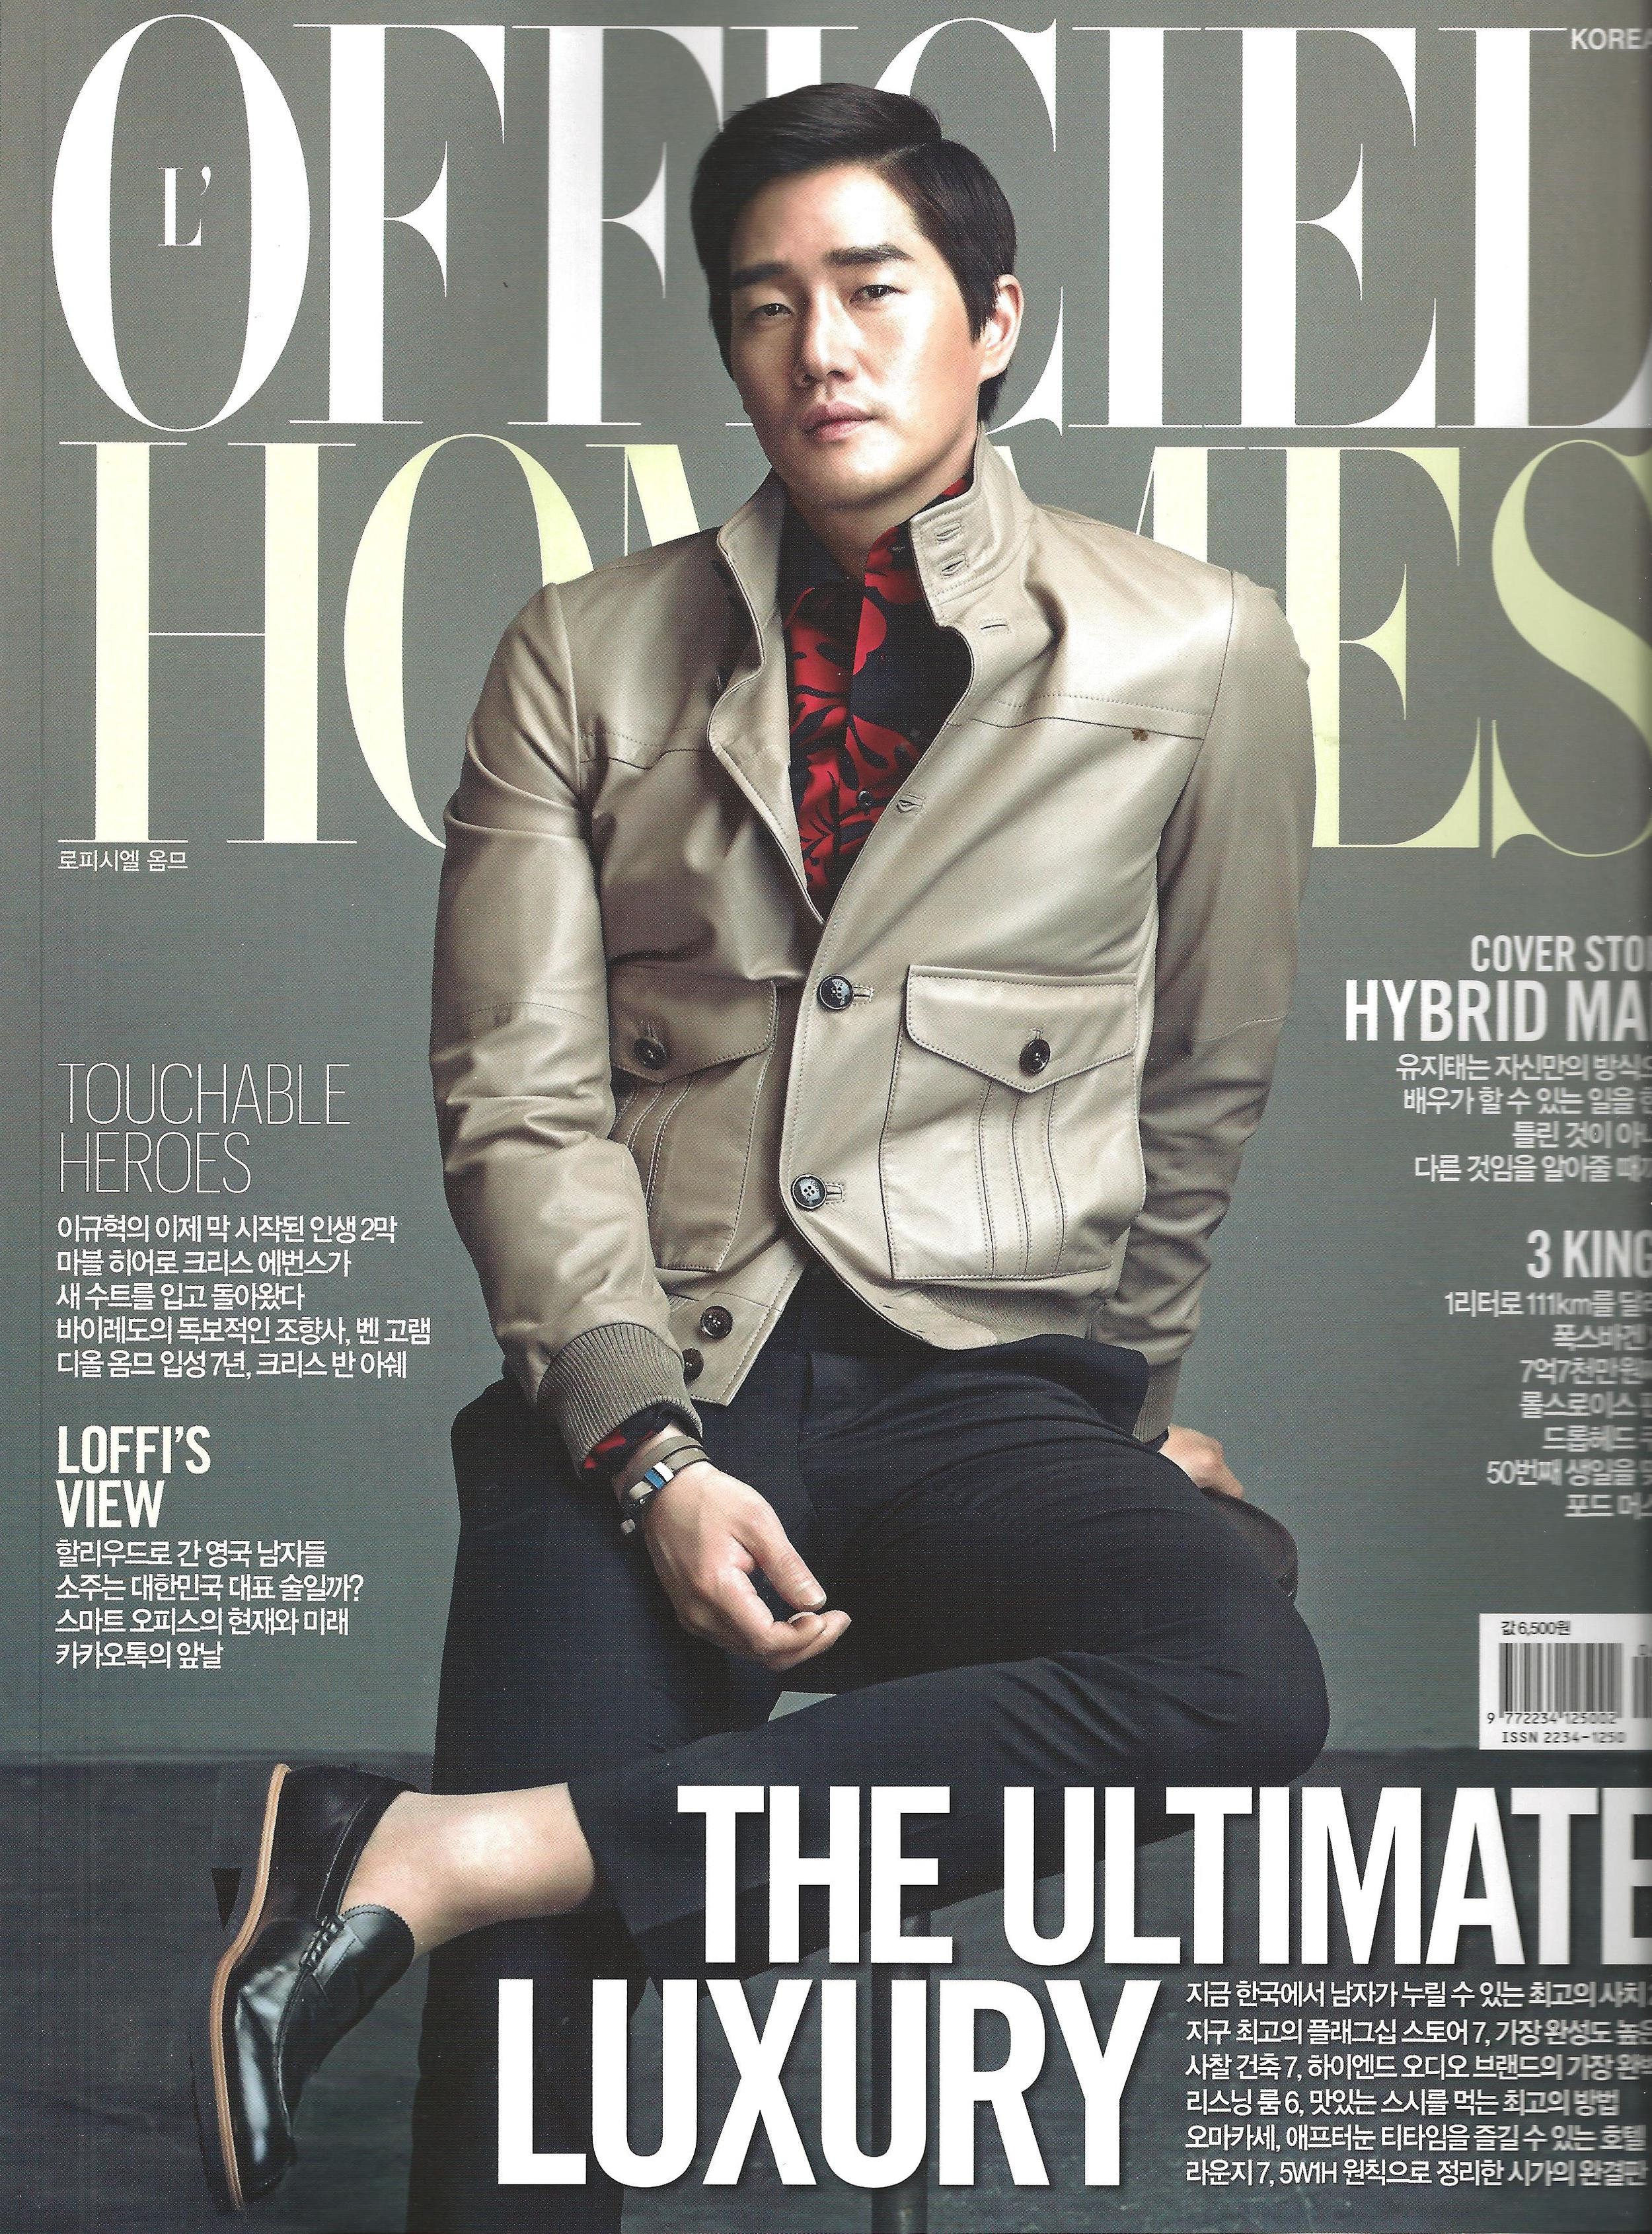 2014-4 Officiel Homme cover.jpg